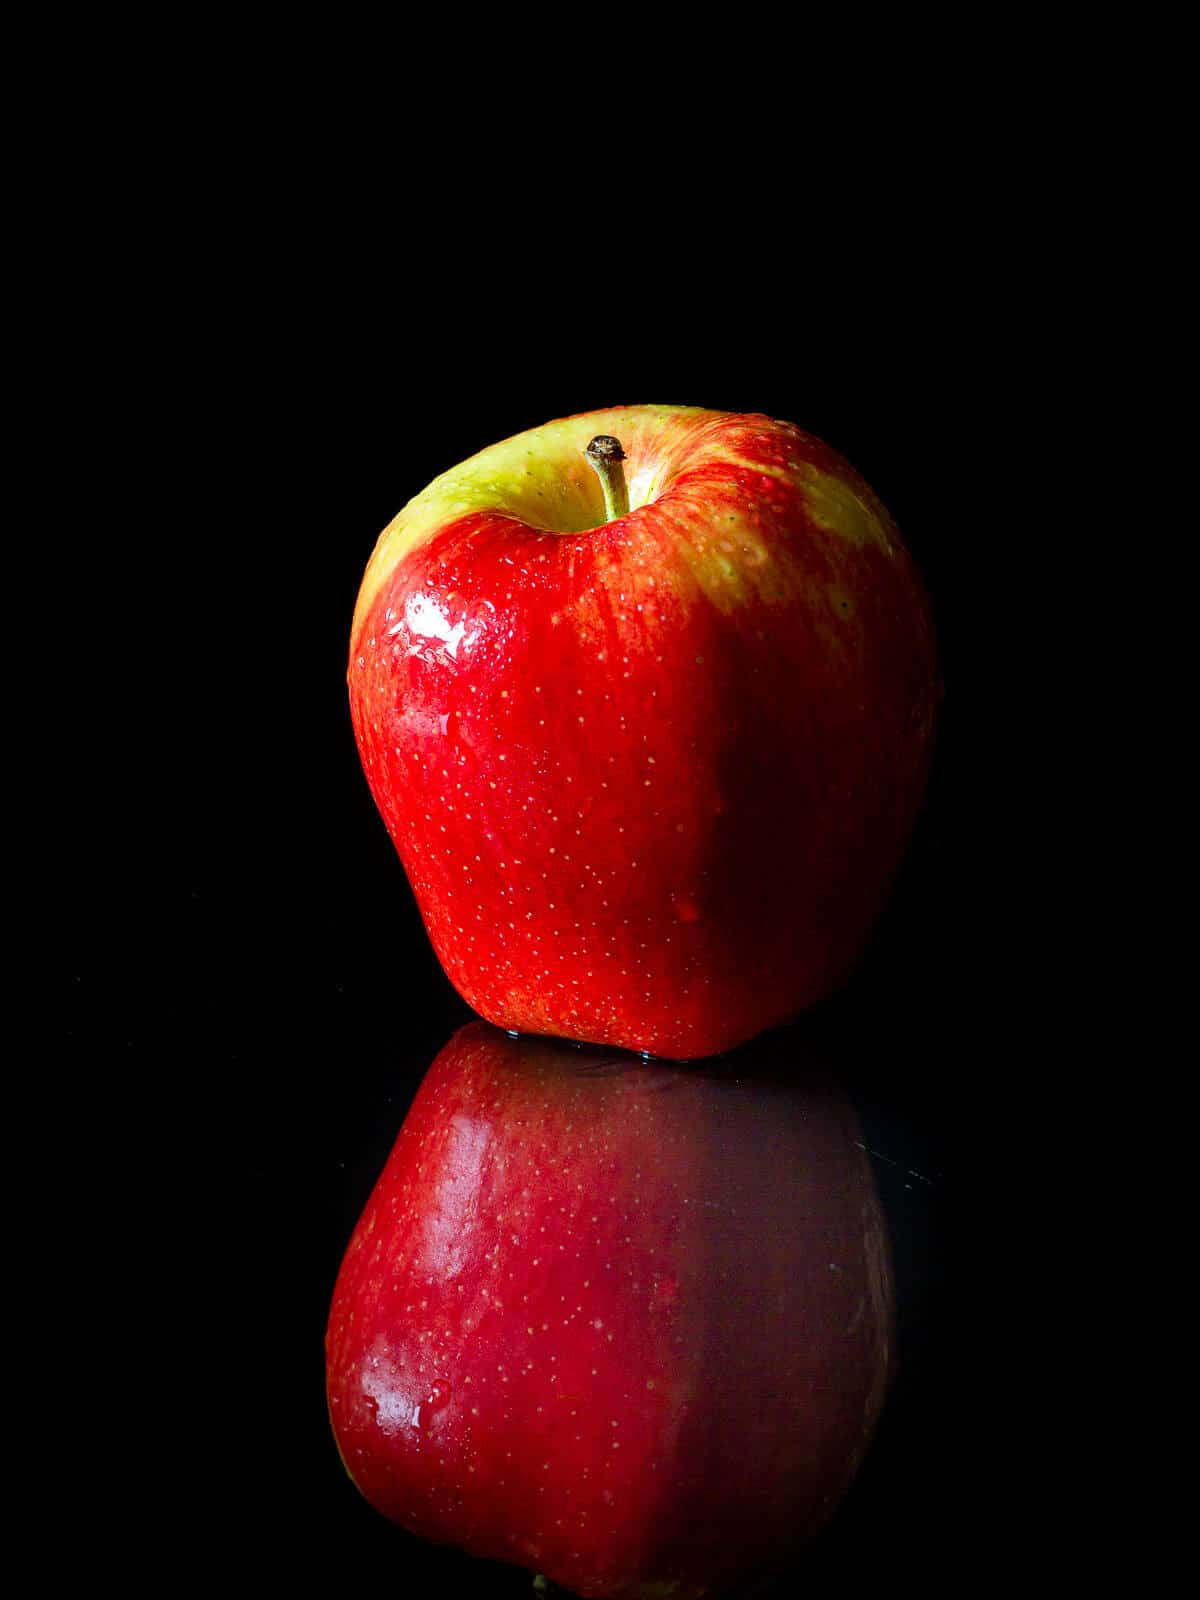 gala apple for unsweetened applesauce